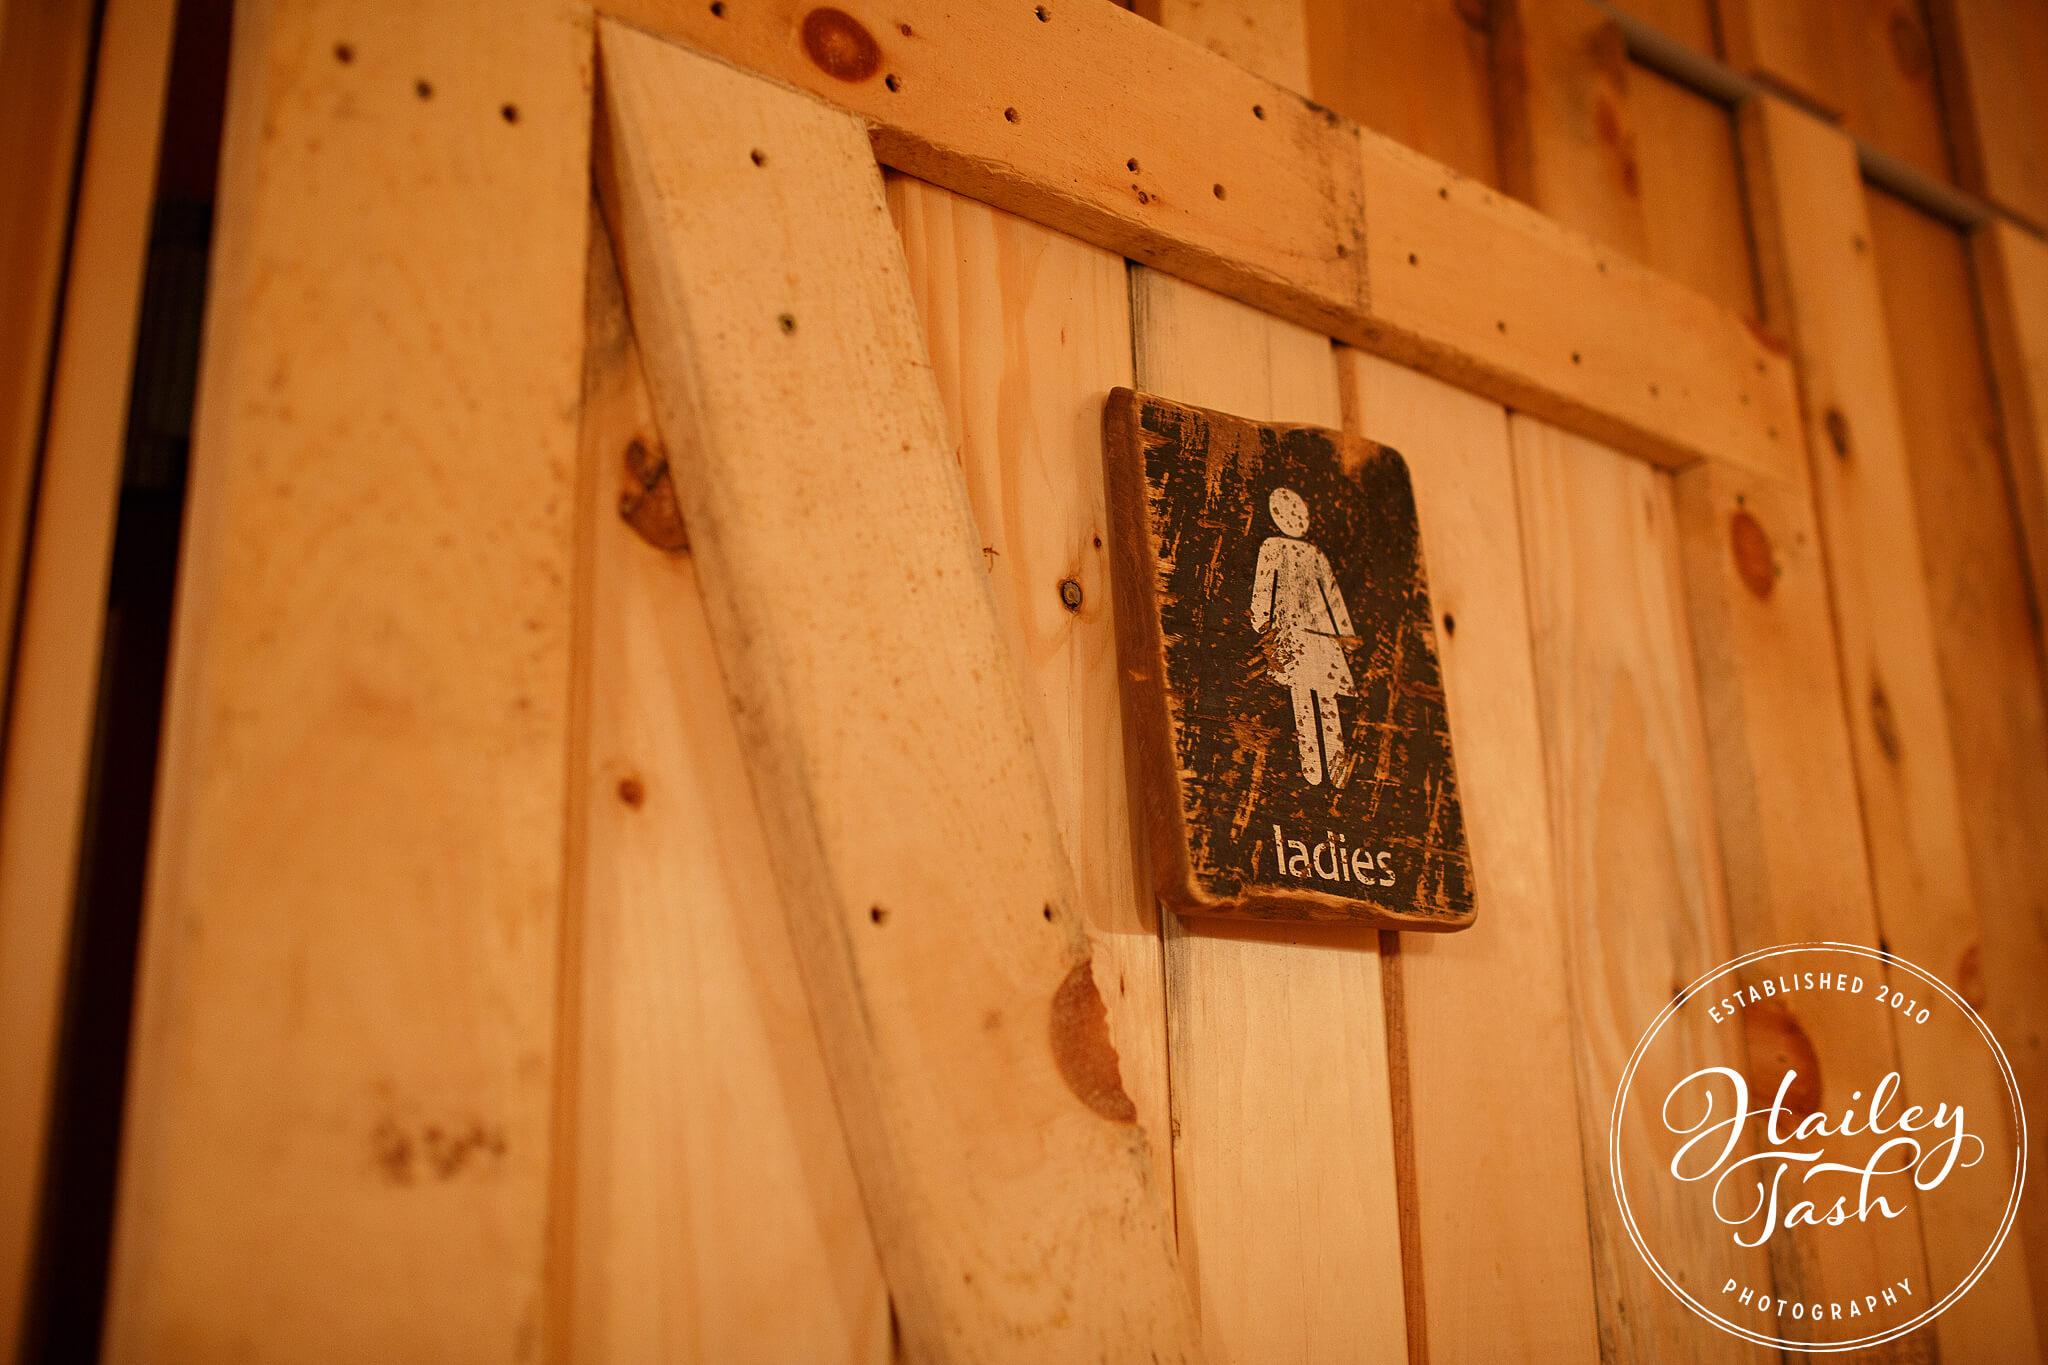 Maine Barn Wedding venue with Bathrooms